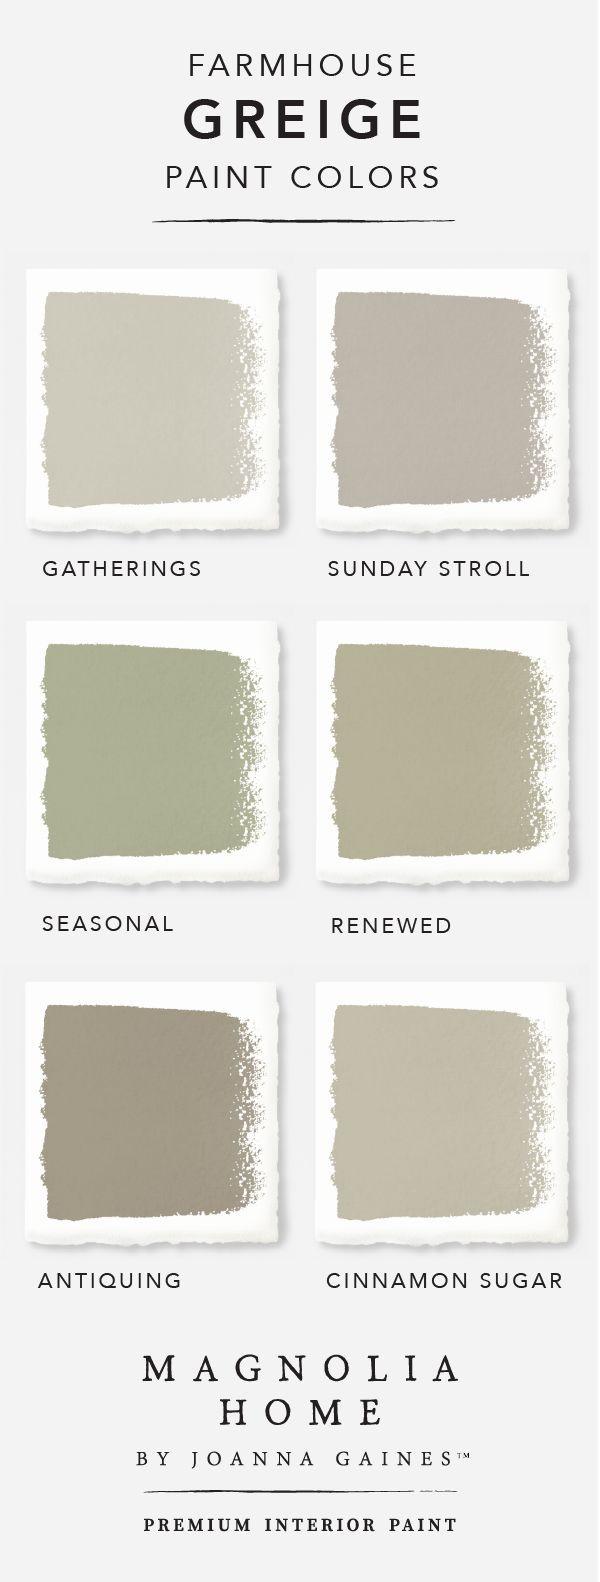 Best ideas about Magnolia Paint Colors . Save or Pin Best 25 Magnolia paint ideas on Pinterest Now.